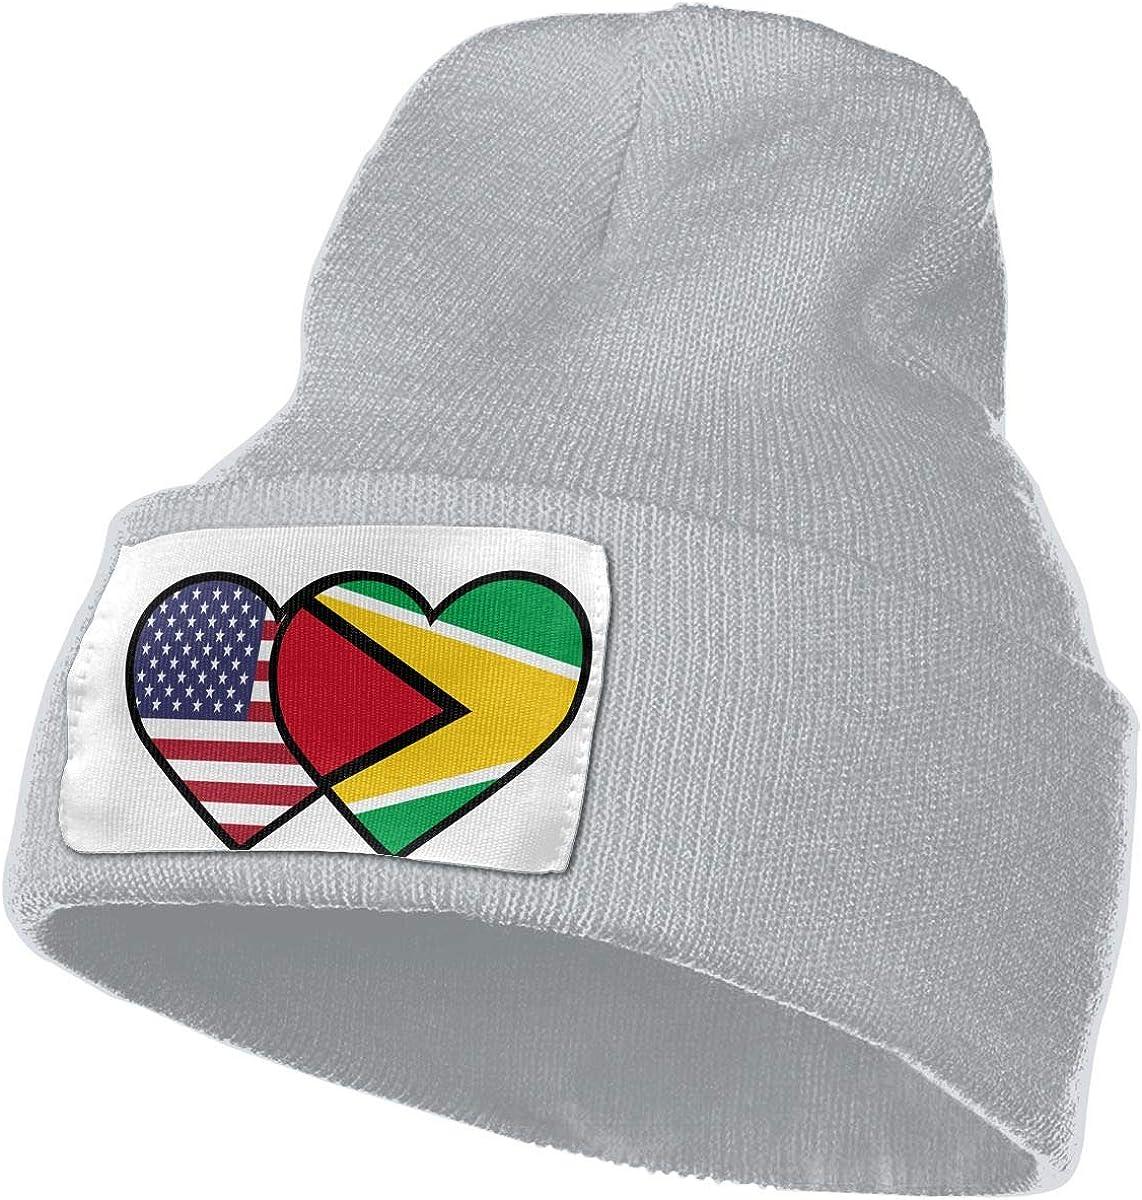 TAOMAP89 Guyana USA Flag Twin Heart Women and Men Skull Caps Winter Warm Stretchy Knitting Beanie Hats